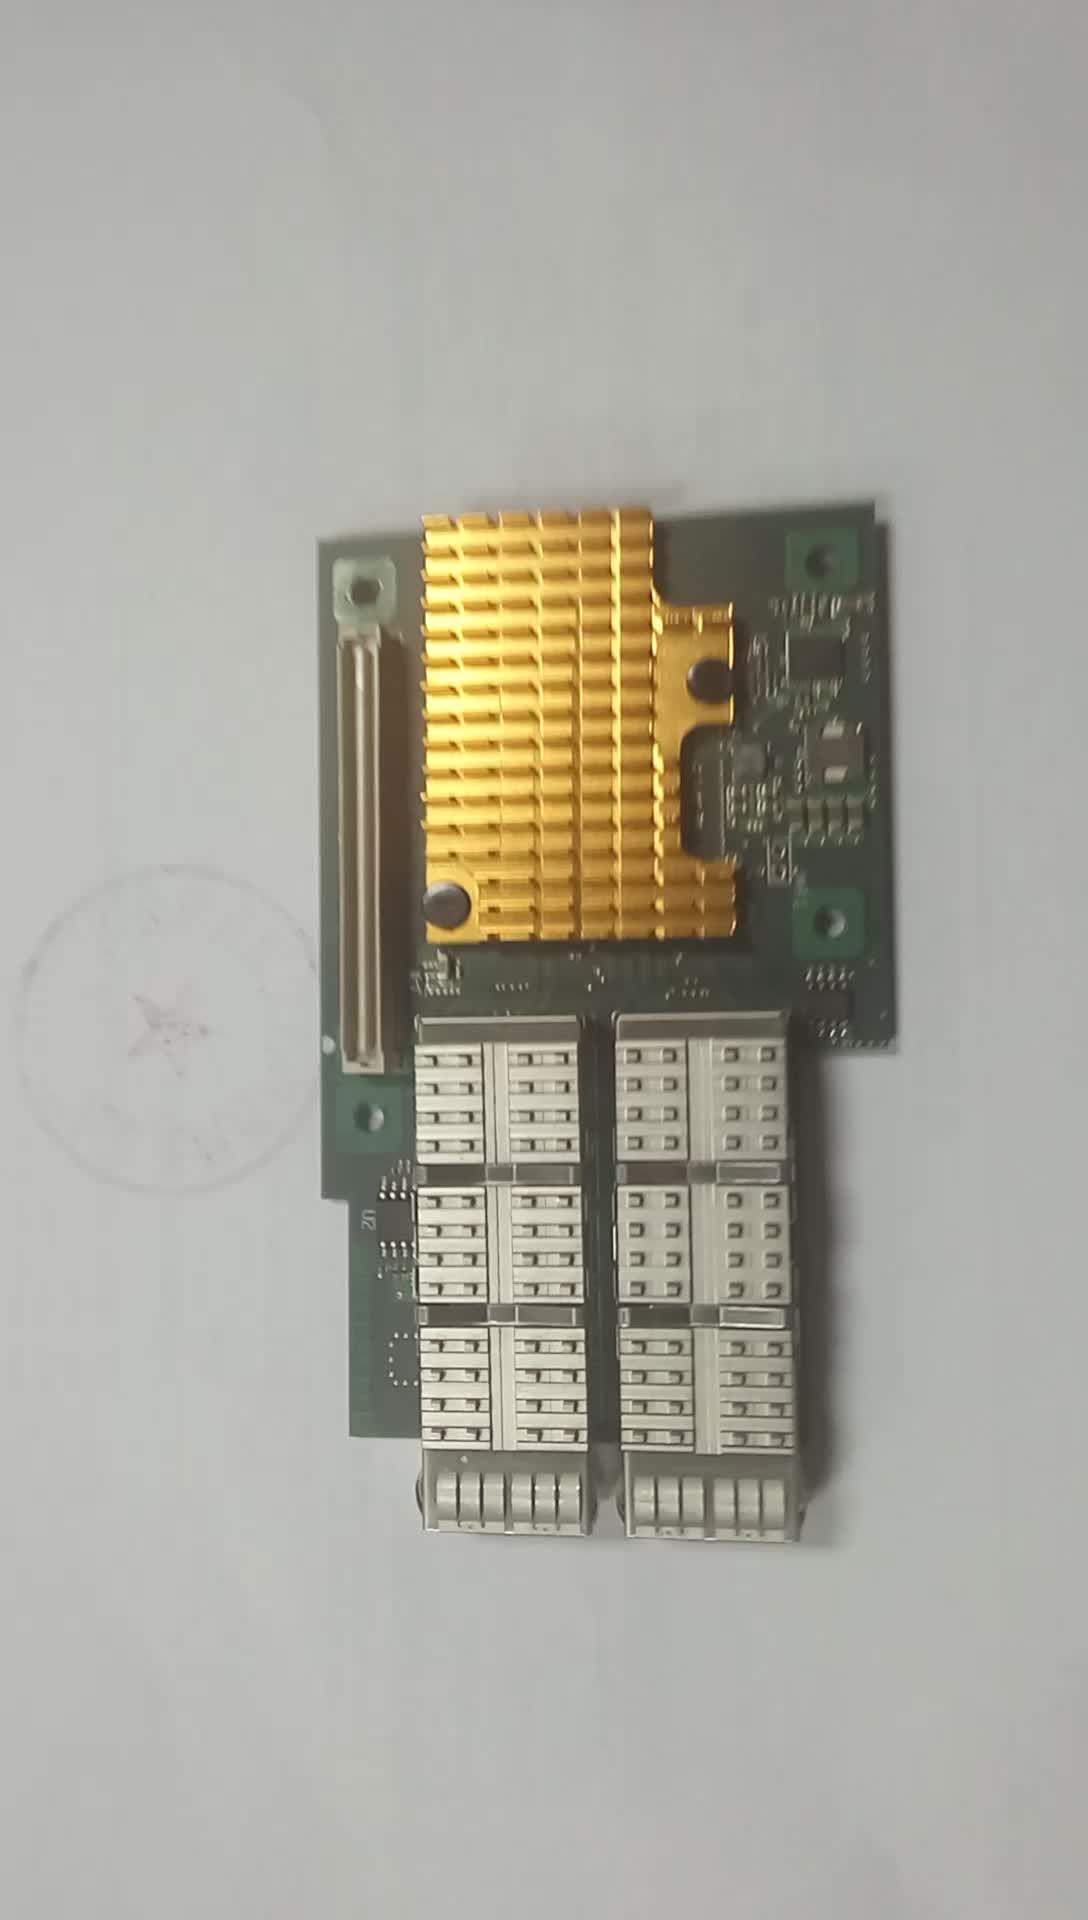 Dual Port QSFP+ 40 Gigabit Ethernet OCP Mezzanine Card Intel XL710-BM2 Based F4002E-OCP